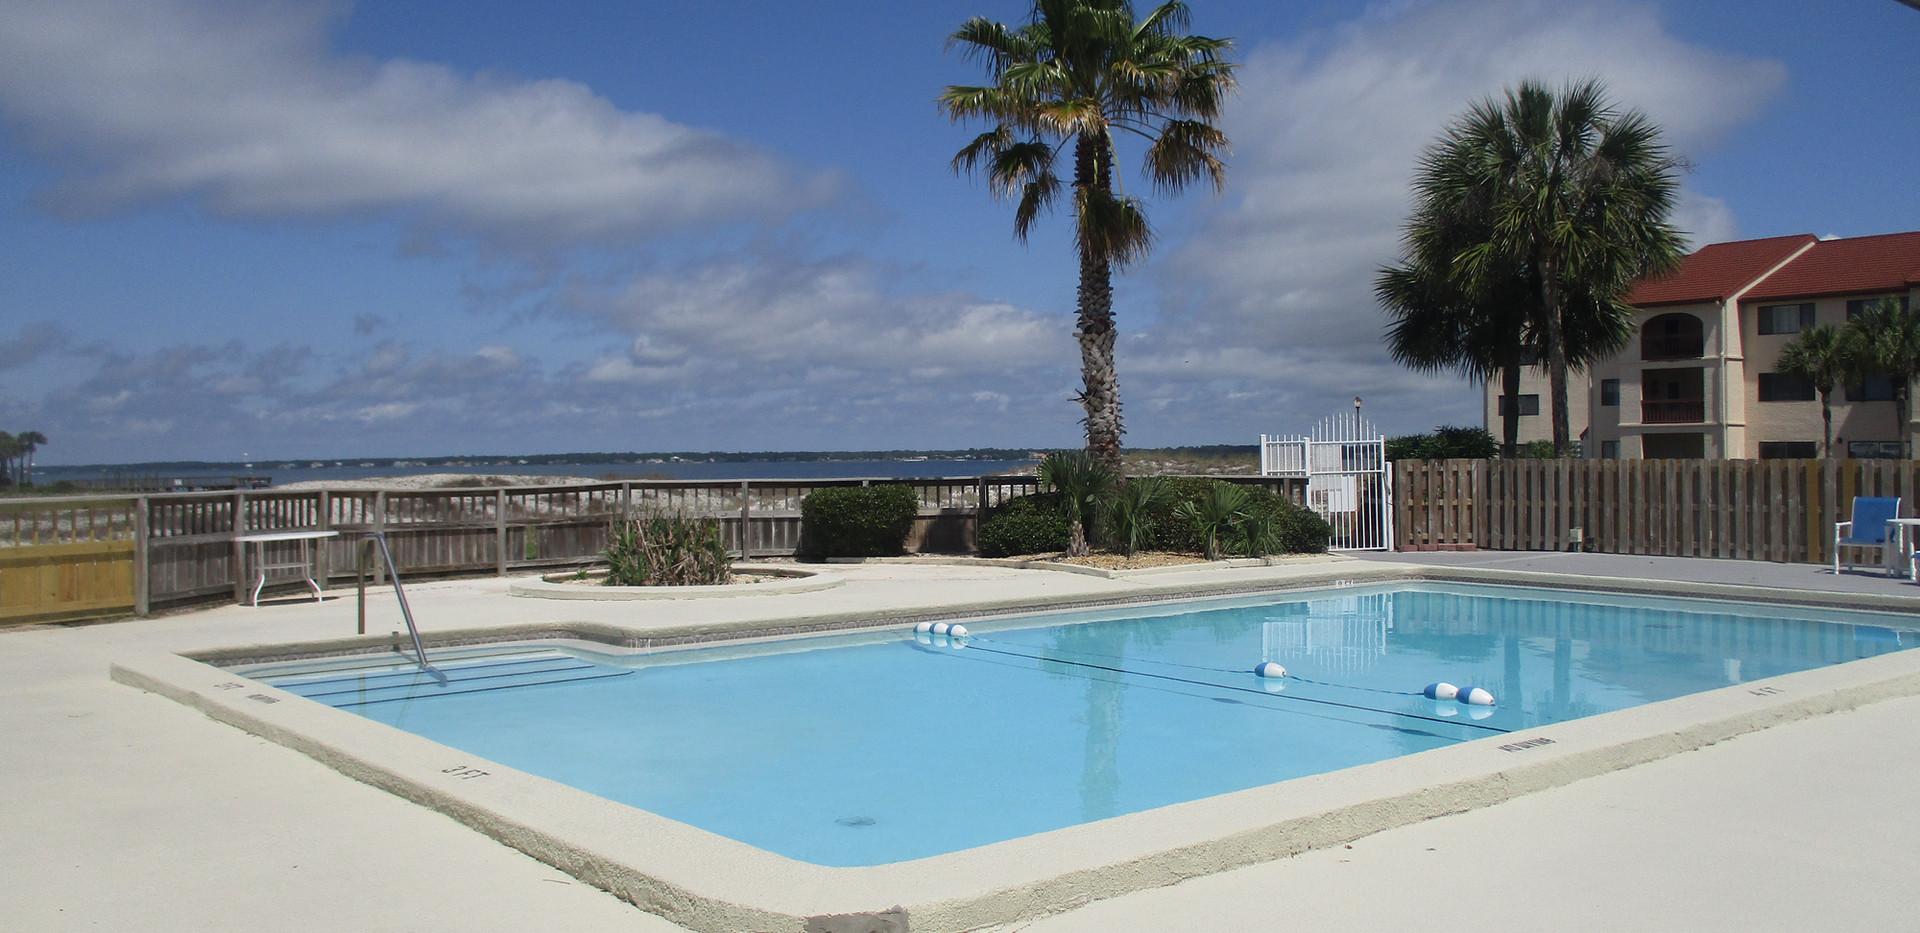 Pool at Sunset Harbor Palms